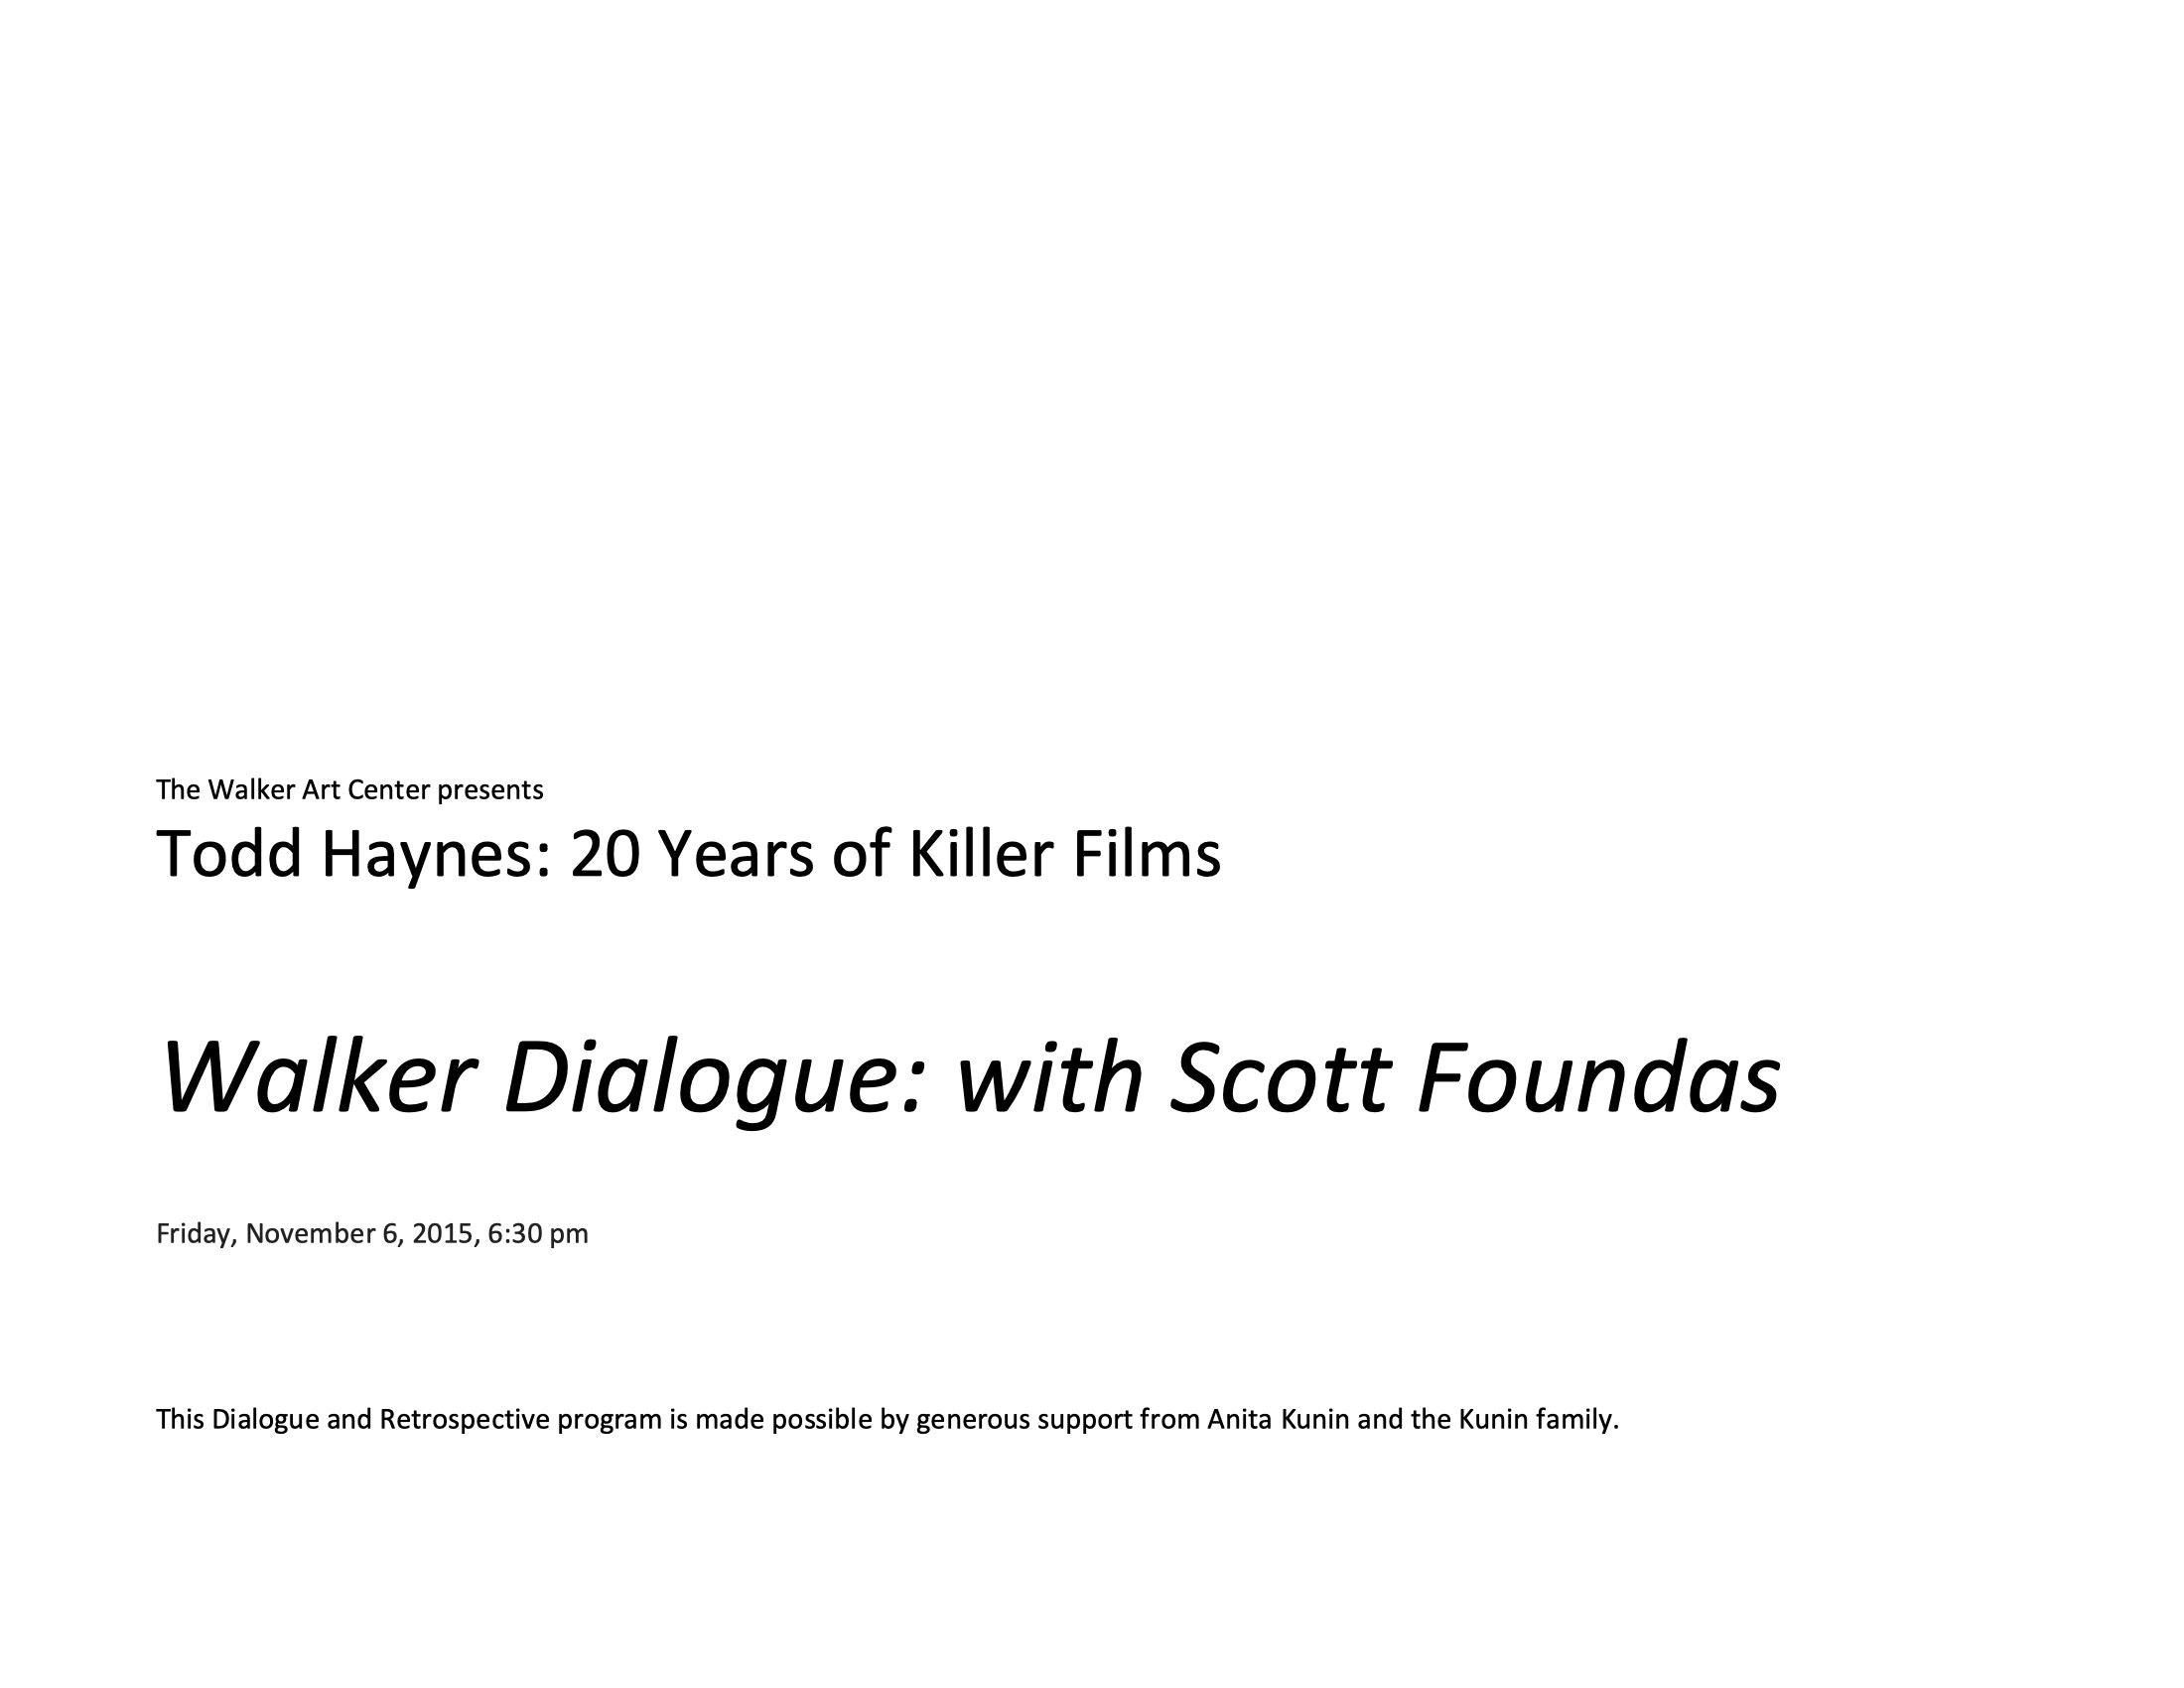 Todd Haynes Dialogues event program notes pg 1